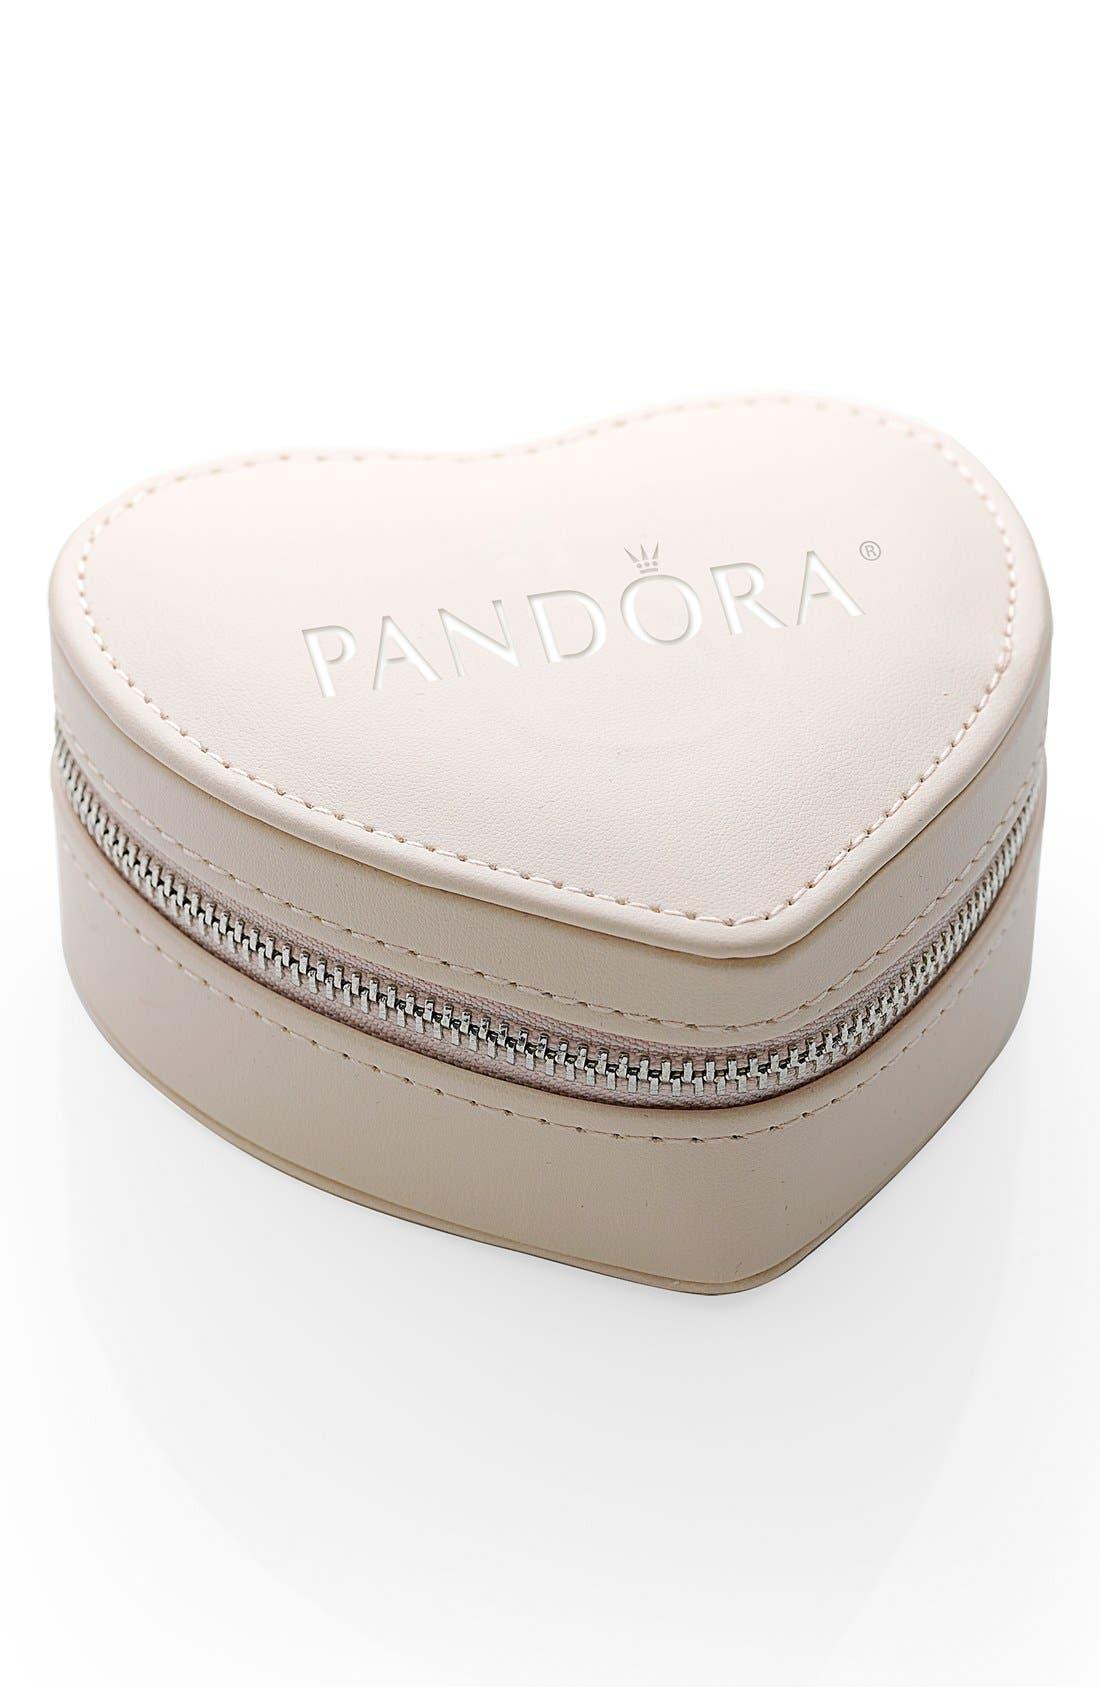 Alternate Image 2  - PANDORA 'From the Heart' Boxed Charm Bracelet Set